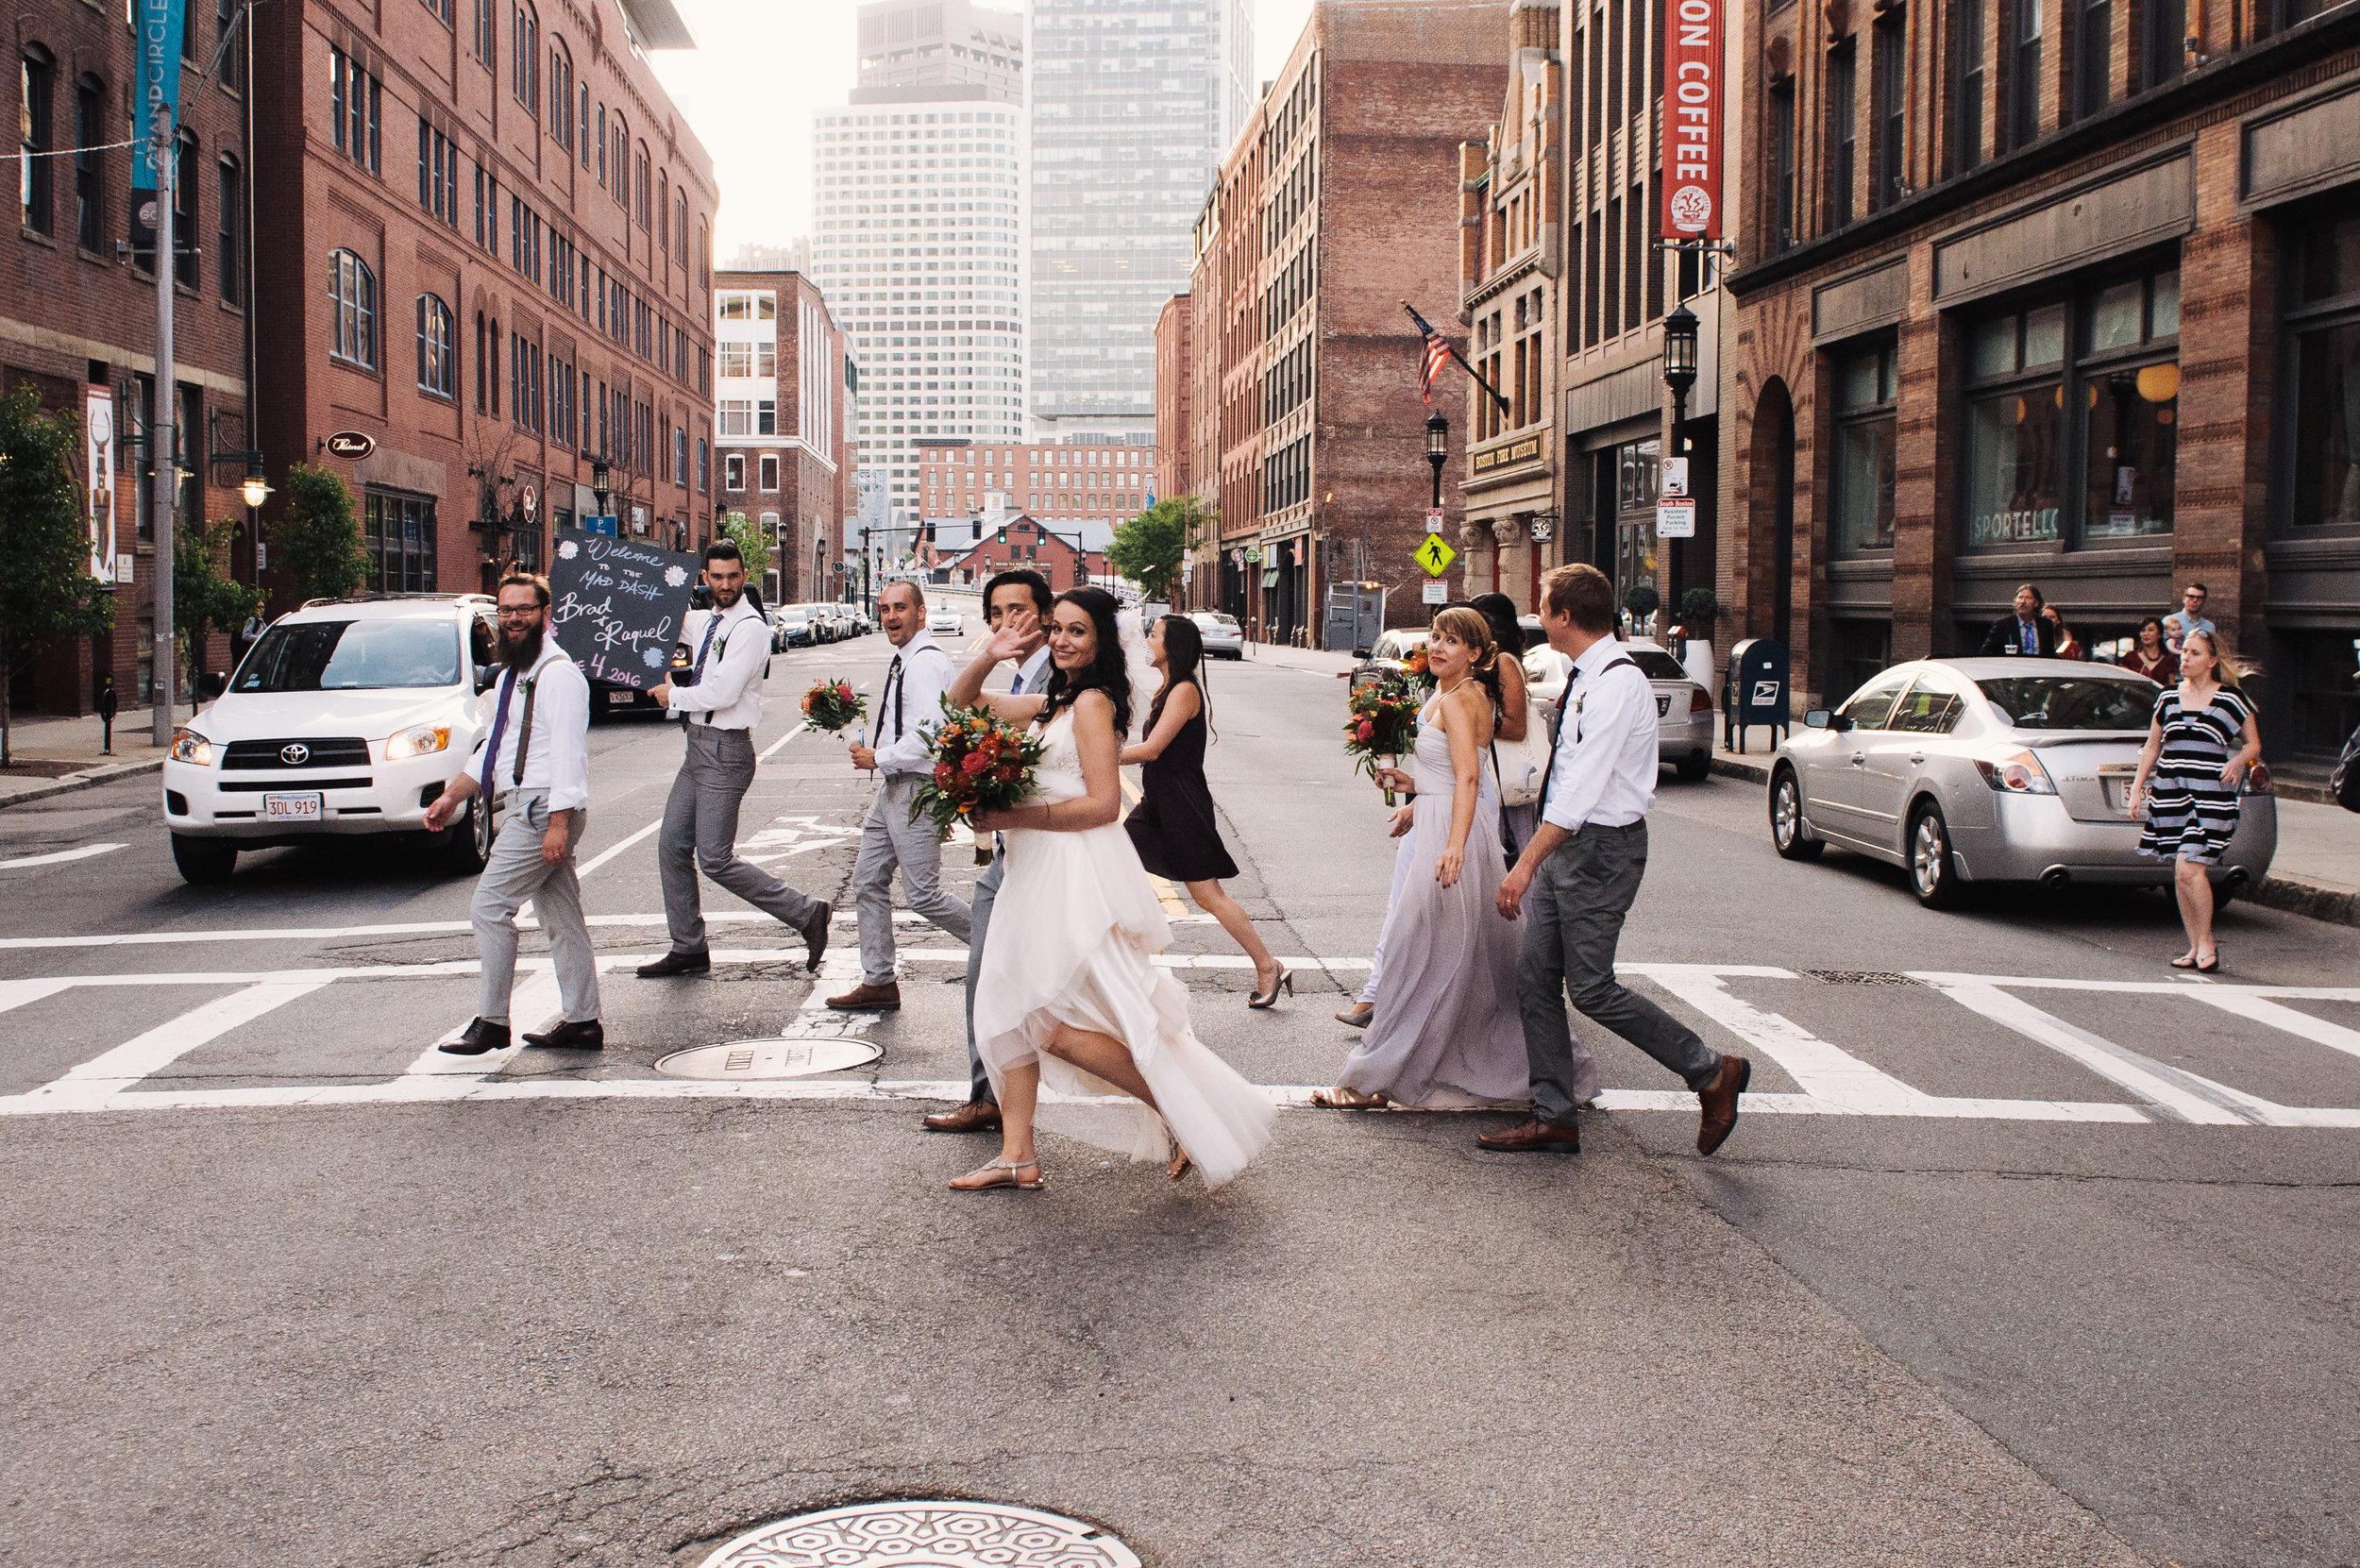 Weddings_BradRaquel_©meghanireland2016_45.jpg